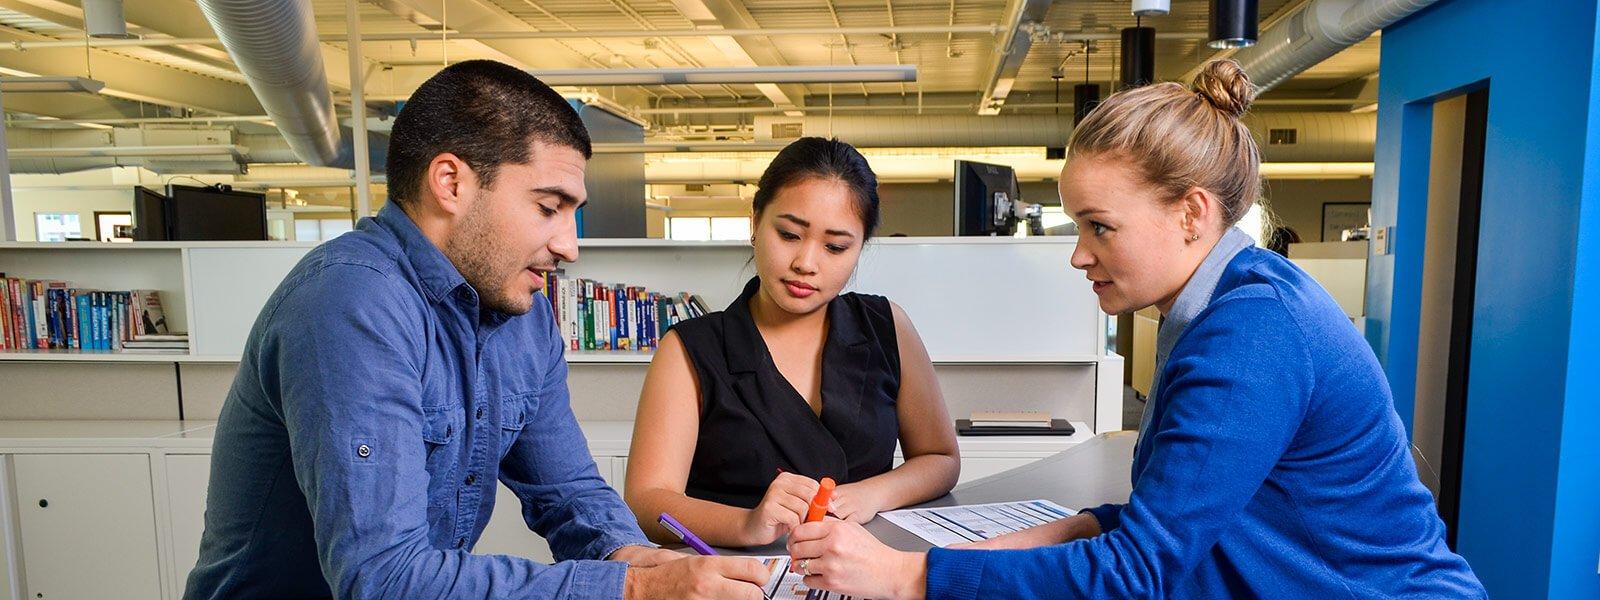 Marketing internship abroad participants